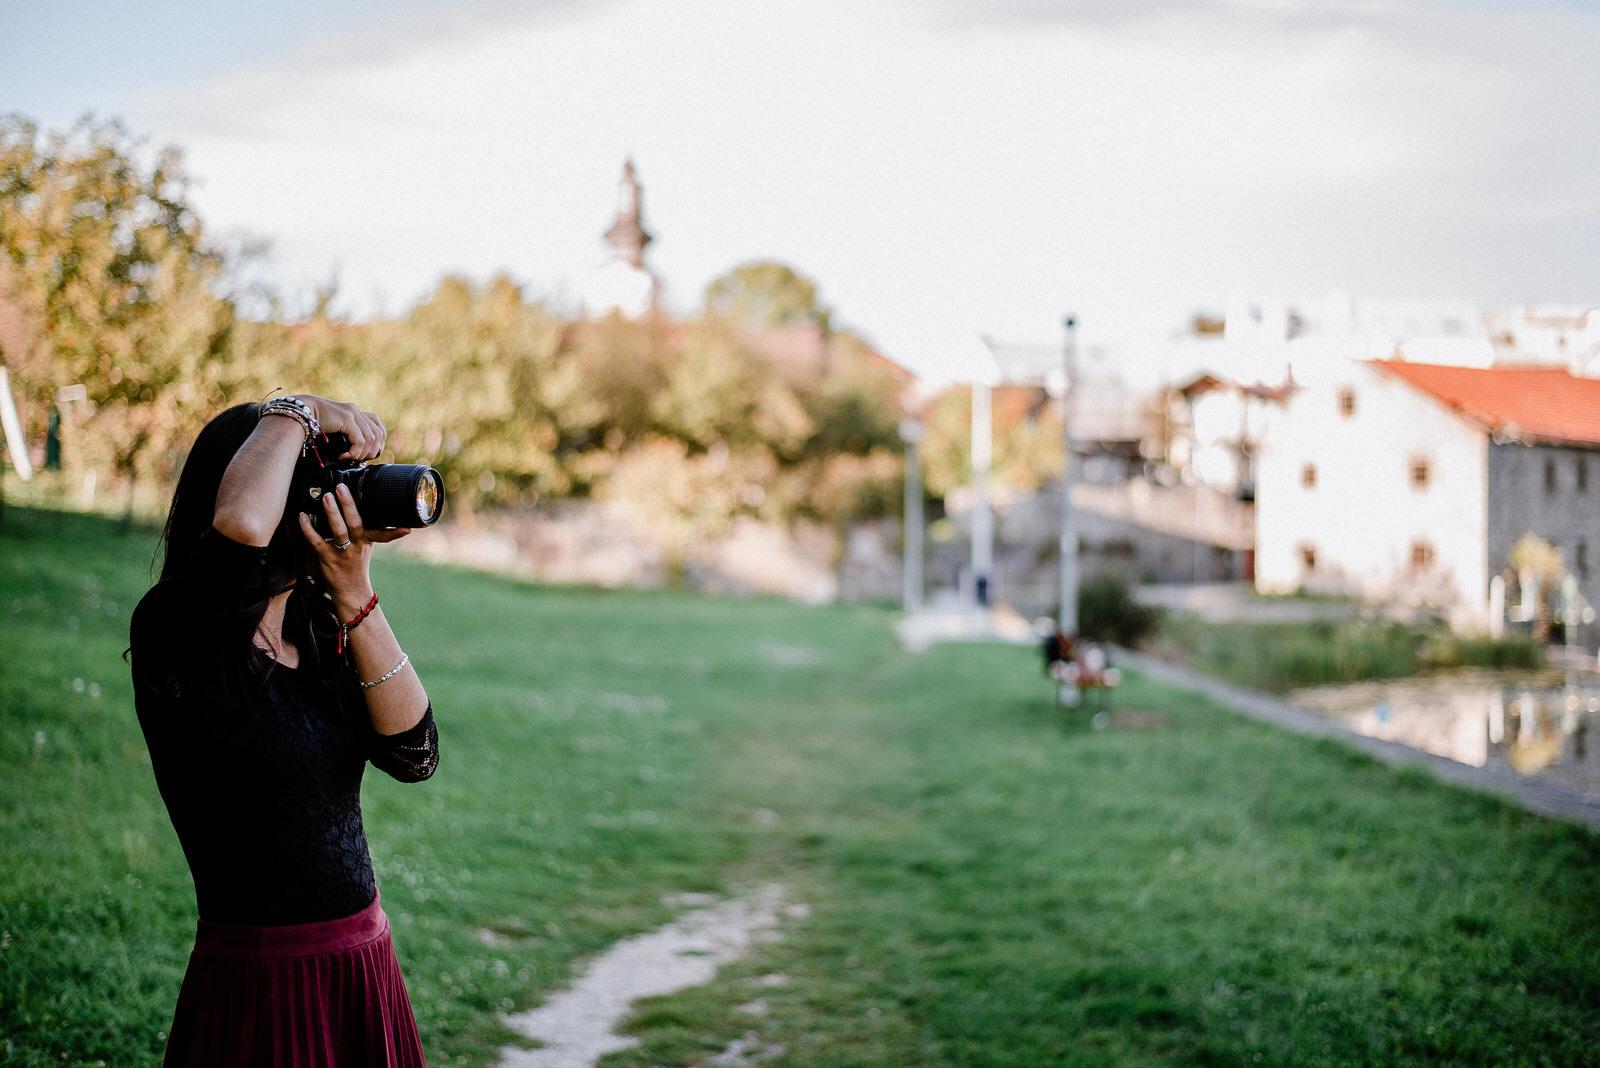 likaclub_intervju-tomislava-i-marija-maras_gospić_2019-13